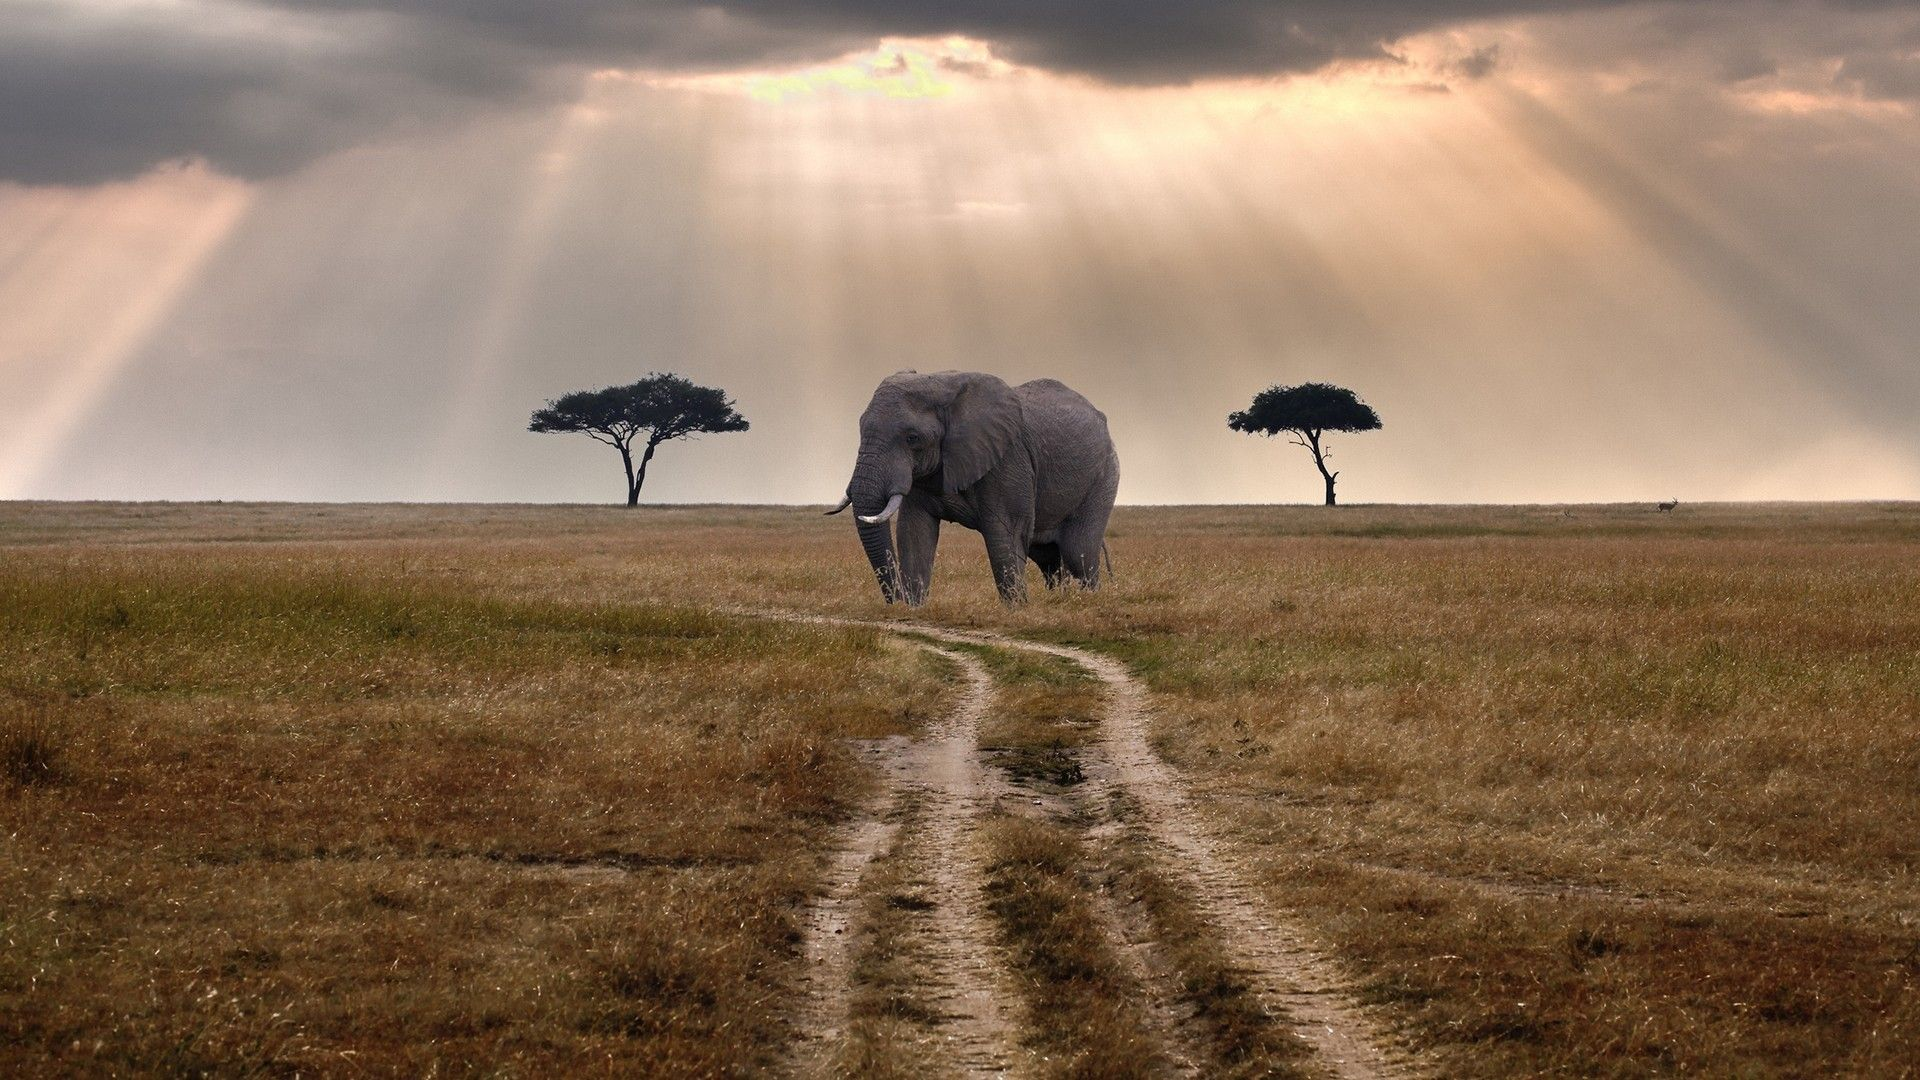 Hd wallpaper elephant - Elephant Hd Wallpaper Bestepics